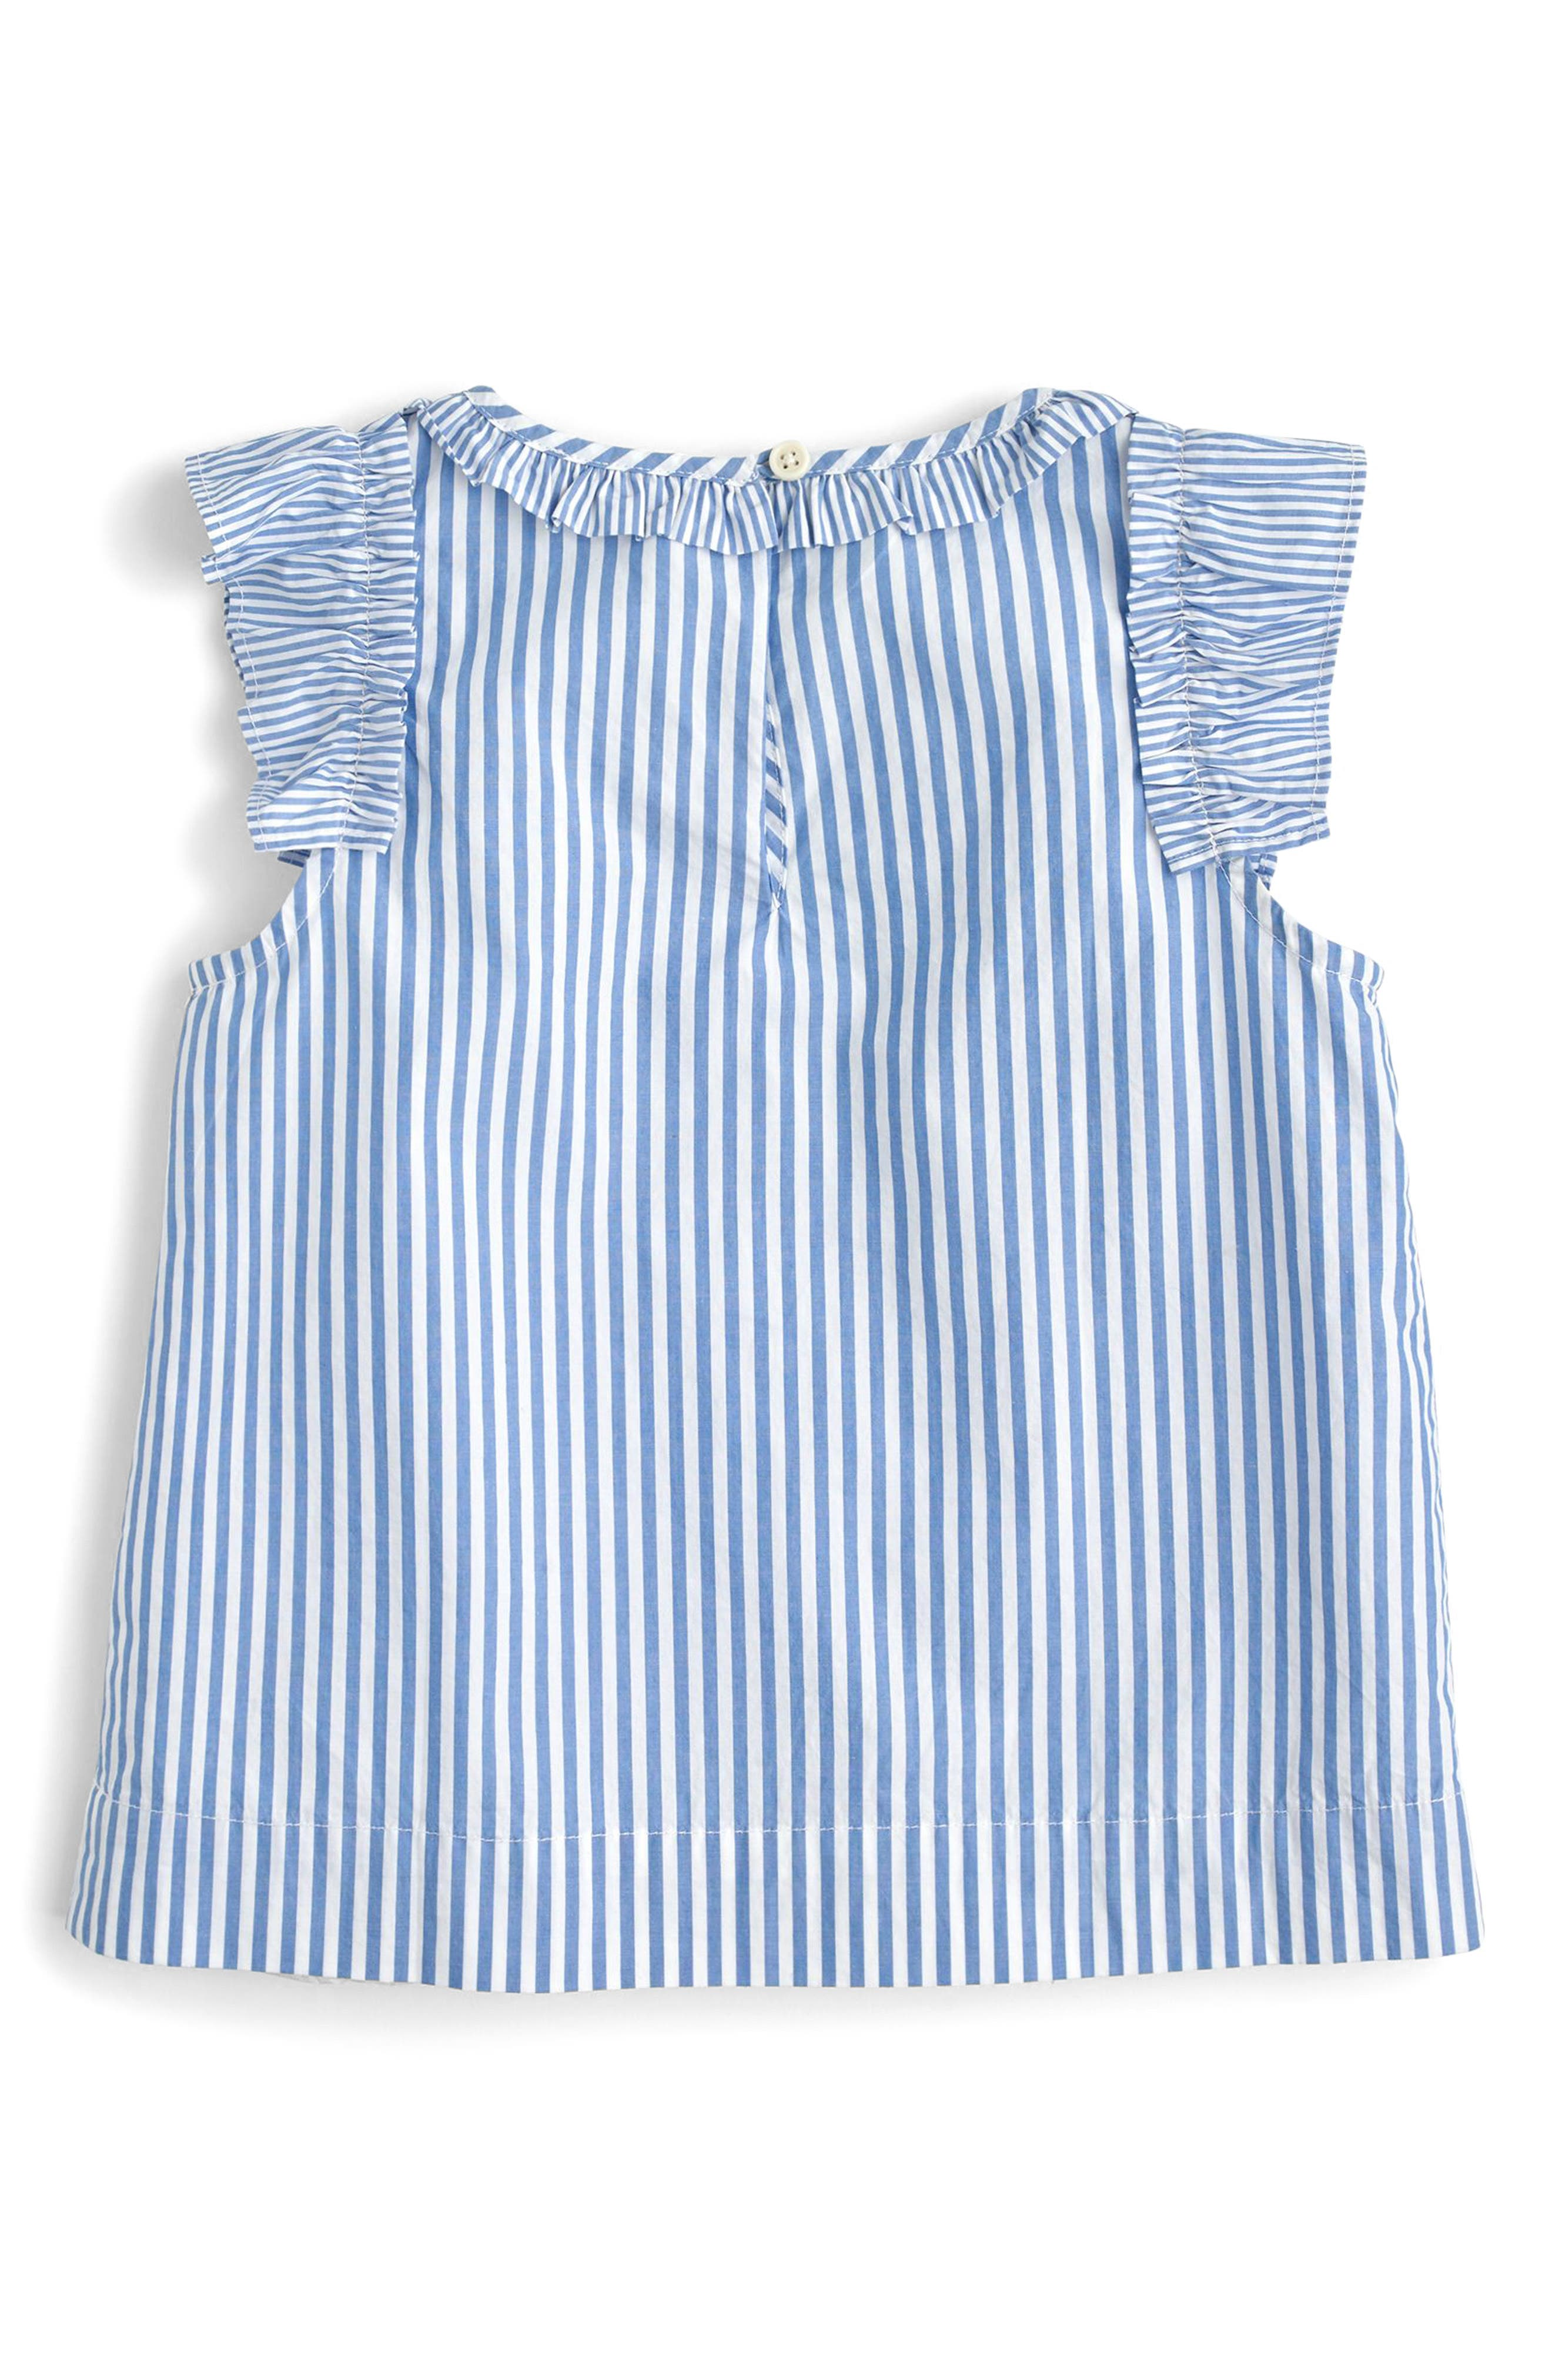 Sarah Ruffle Sleeve Striped Top,                             Alternate thumbnail 2, color,                             Blue White